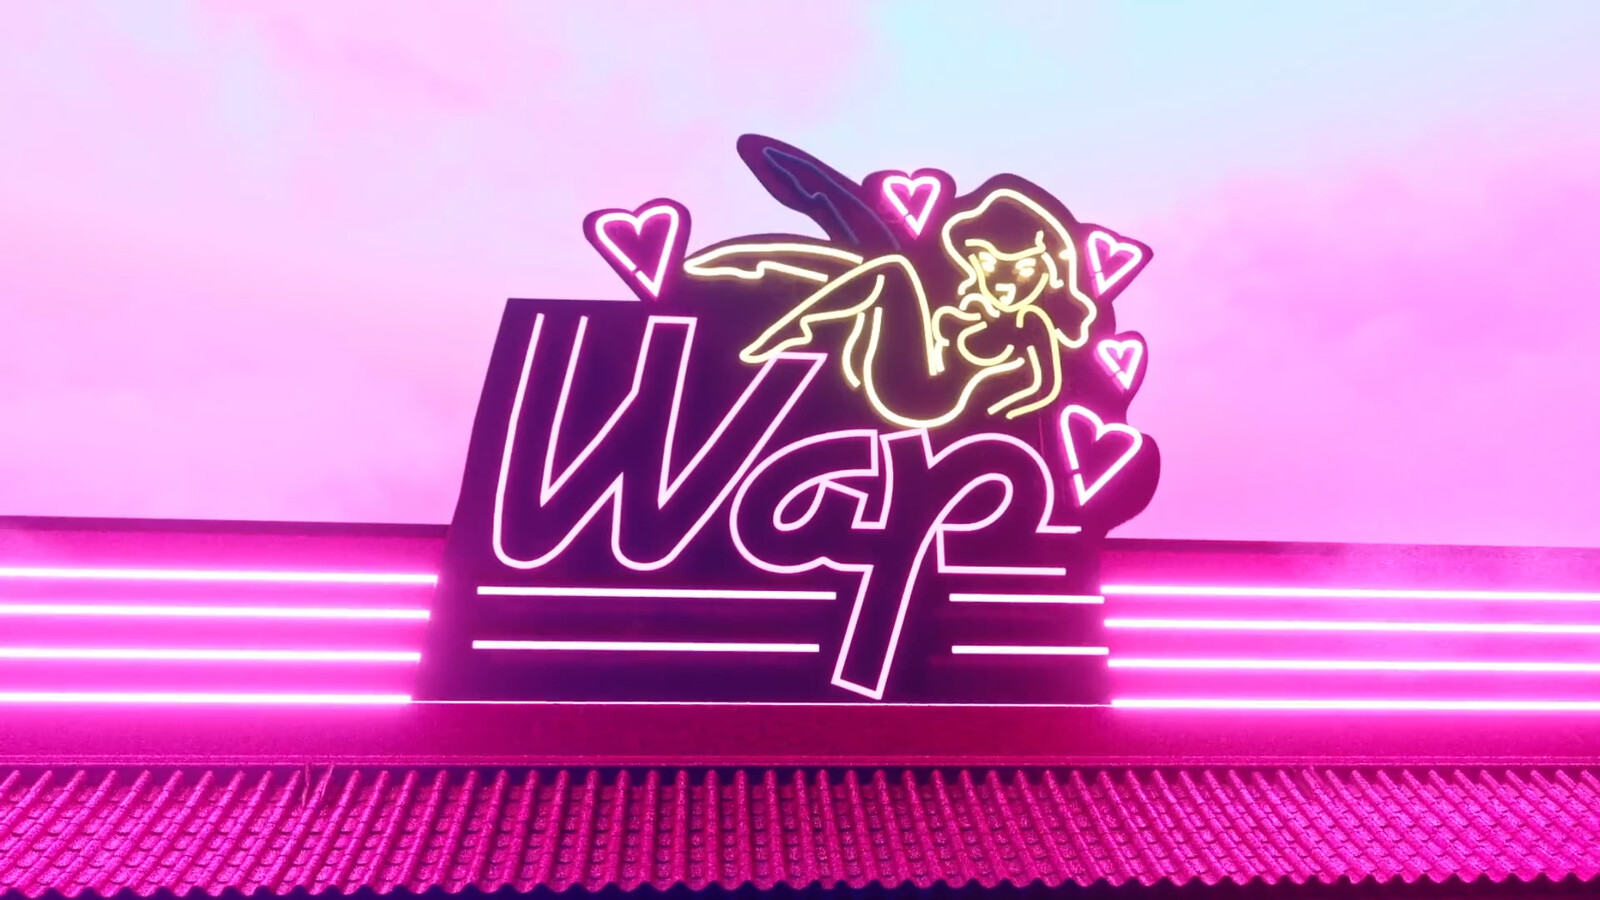 Cardi B - WAP feat. Megan Thee Stallion [Official Lyric Video]